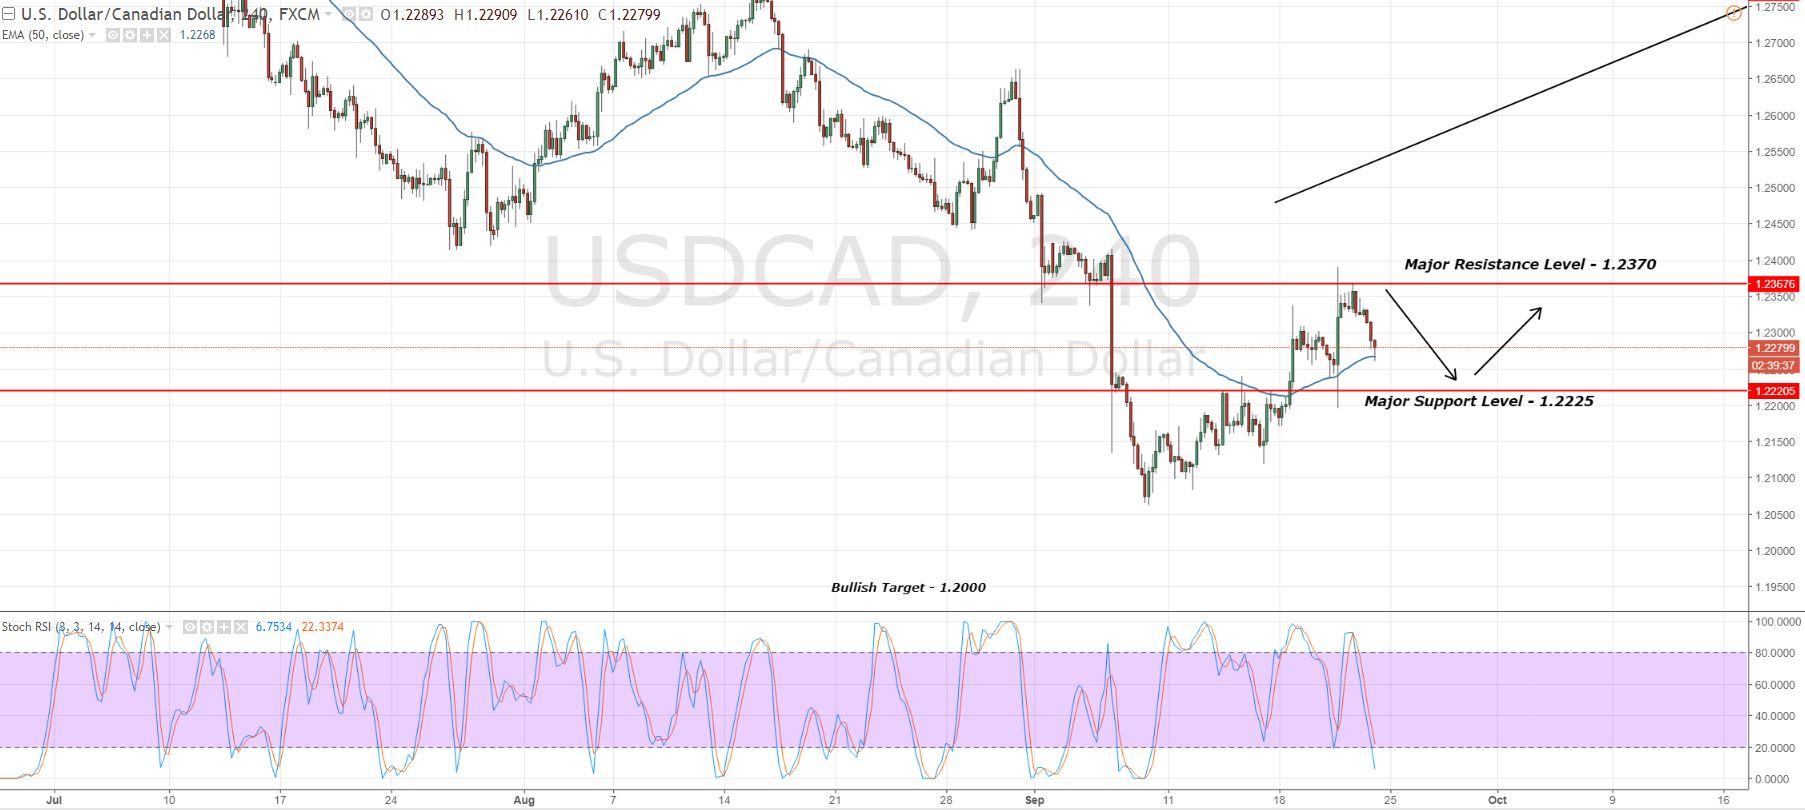 USDCAD - 4 Hour Chart - Trading Range